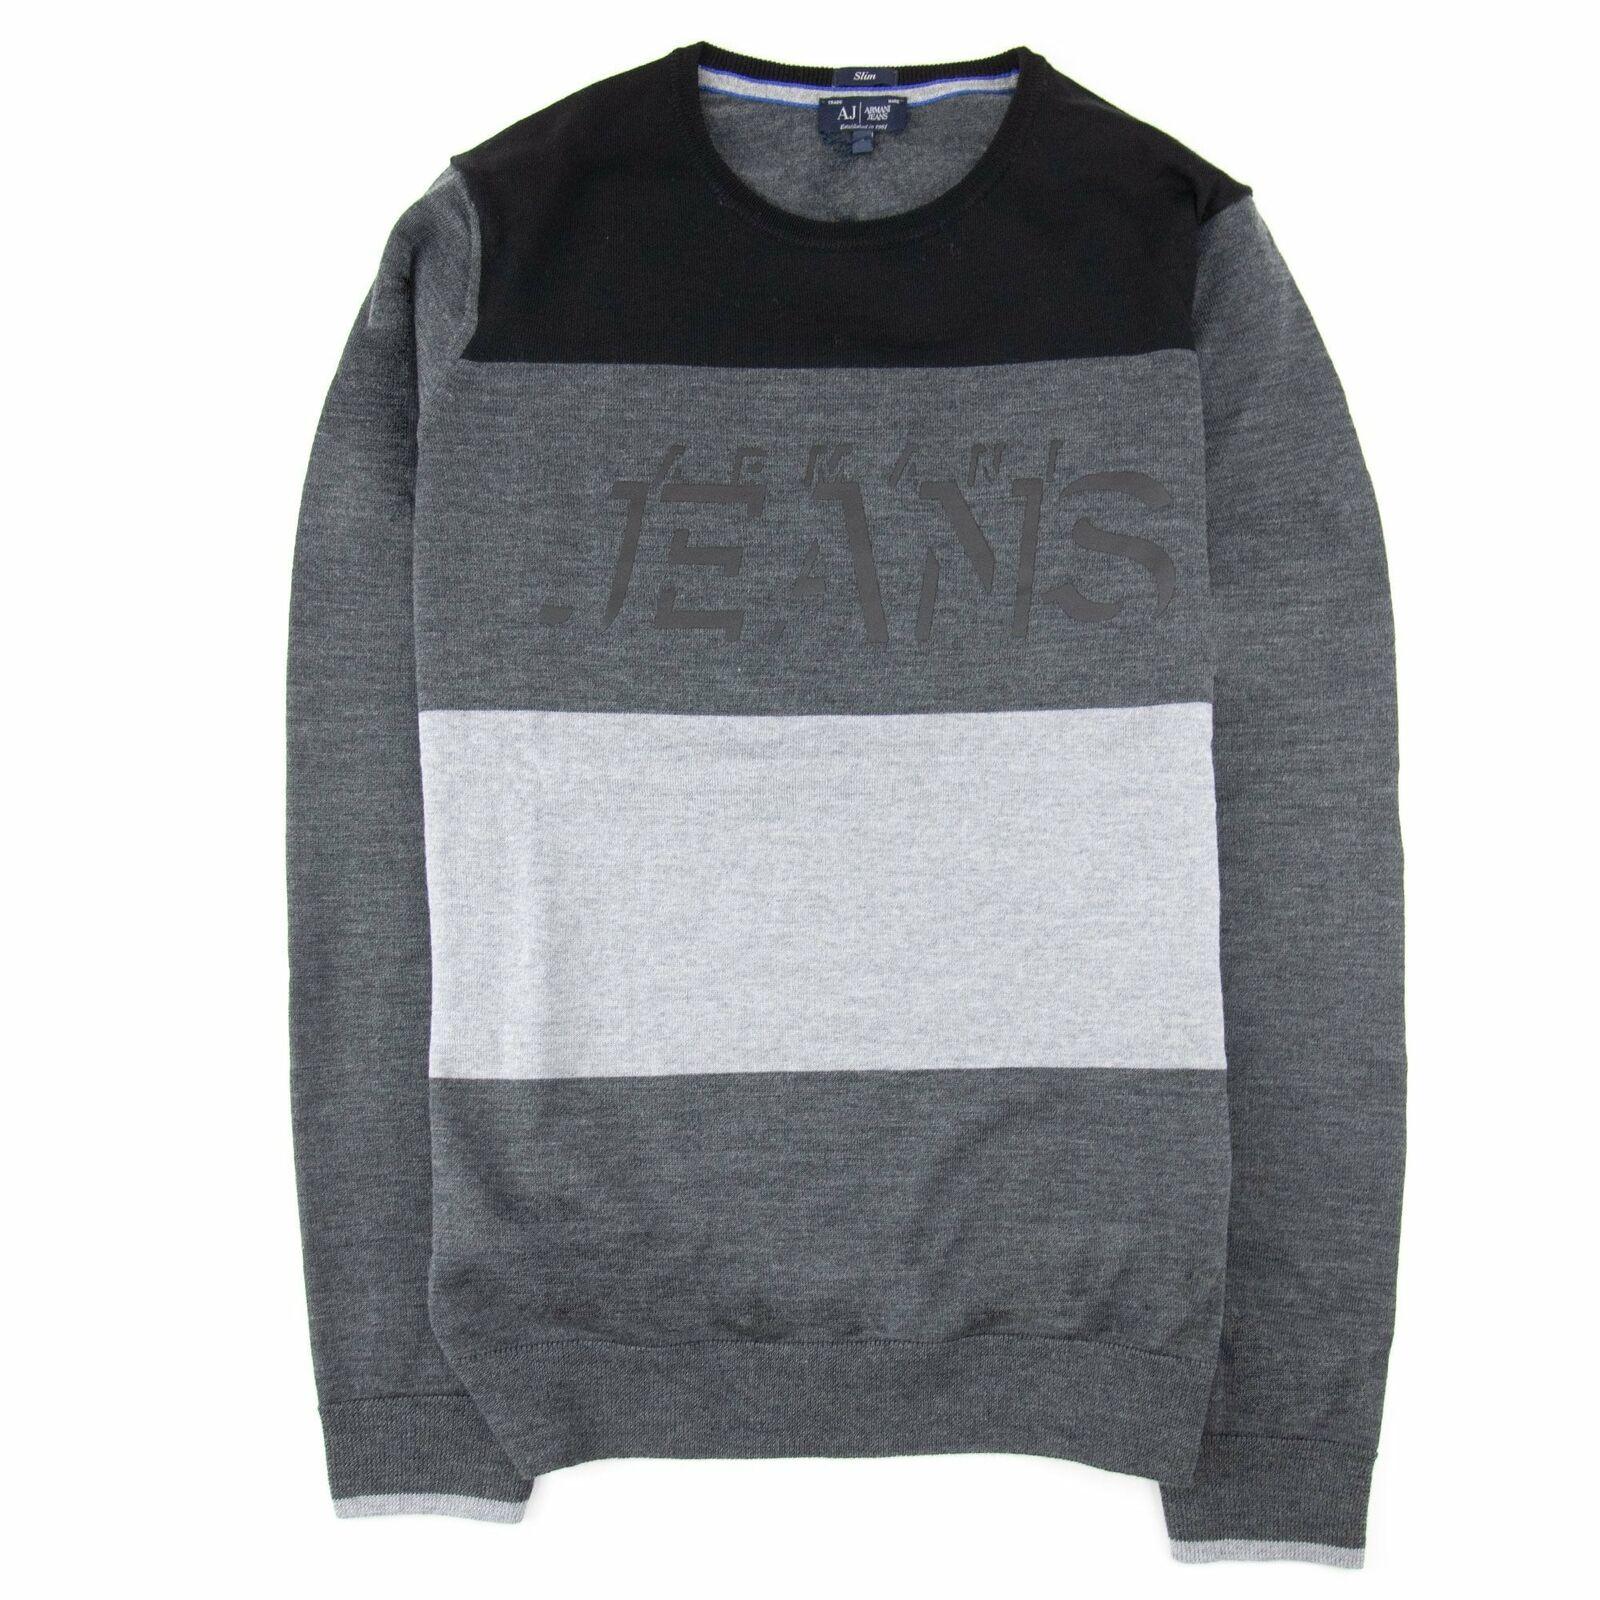 7th Hvn Graphic Print Crewneck Sweatshirt Riga Stripe